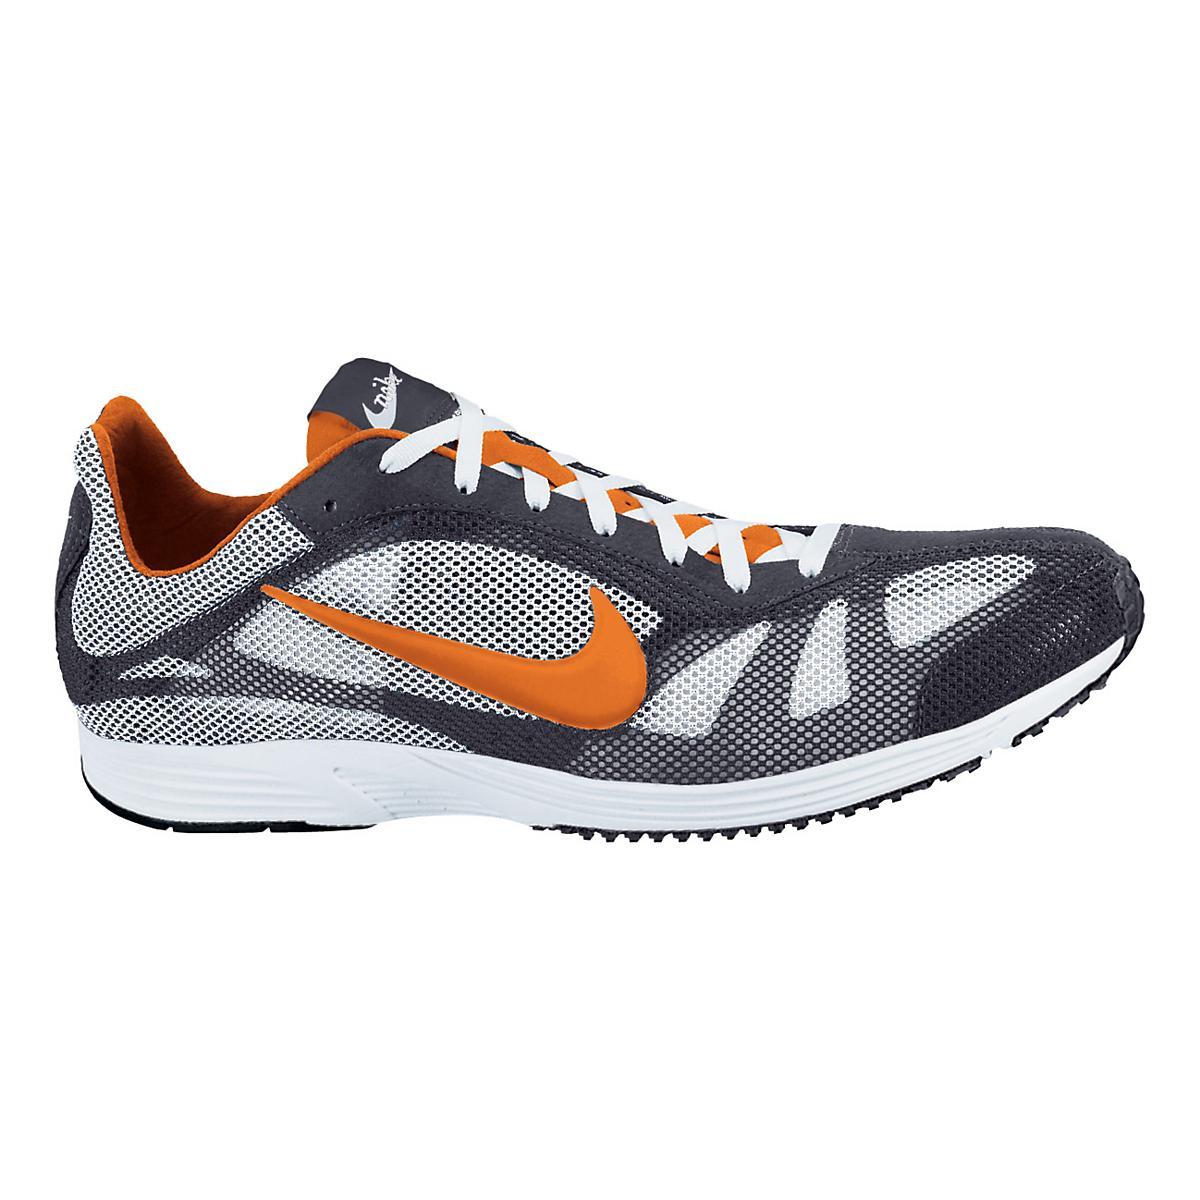 eb79af065559 Nike Zoom Streak XC 2 Racing Shoe at Road Runner Sports